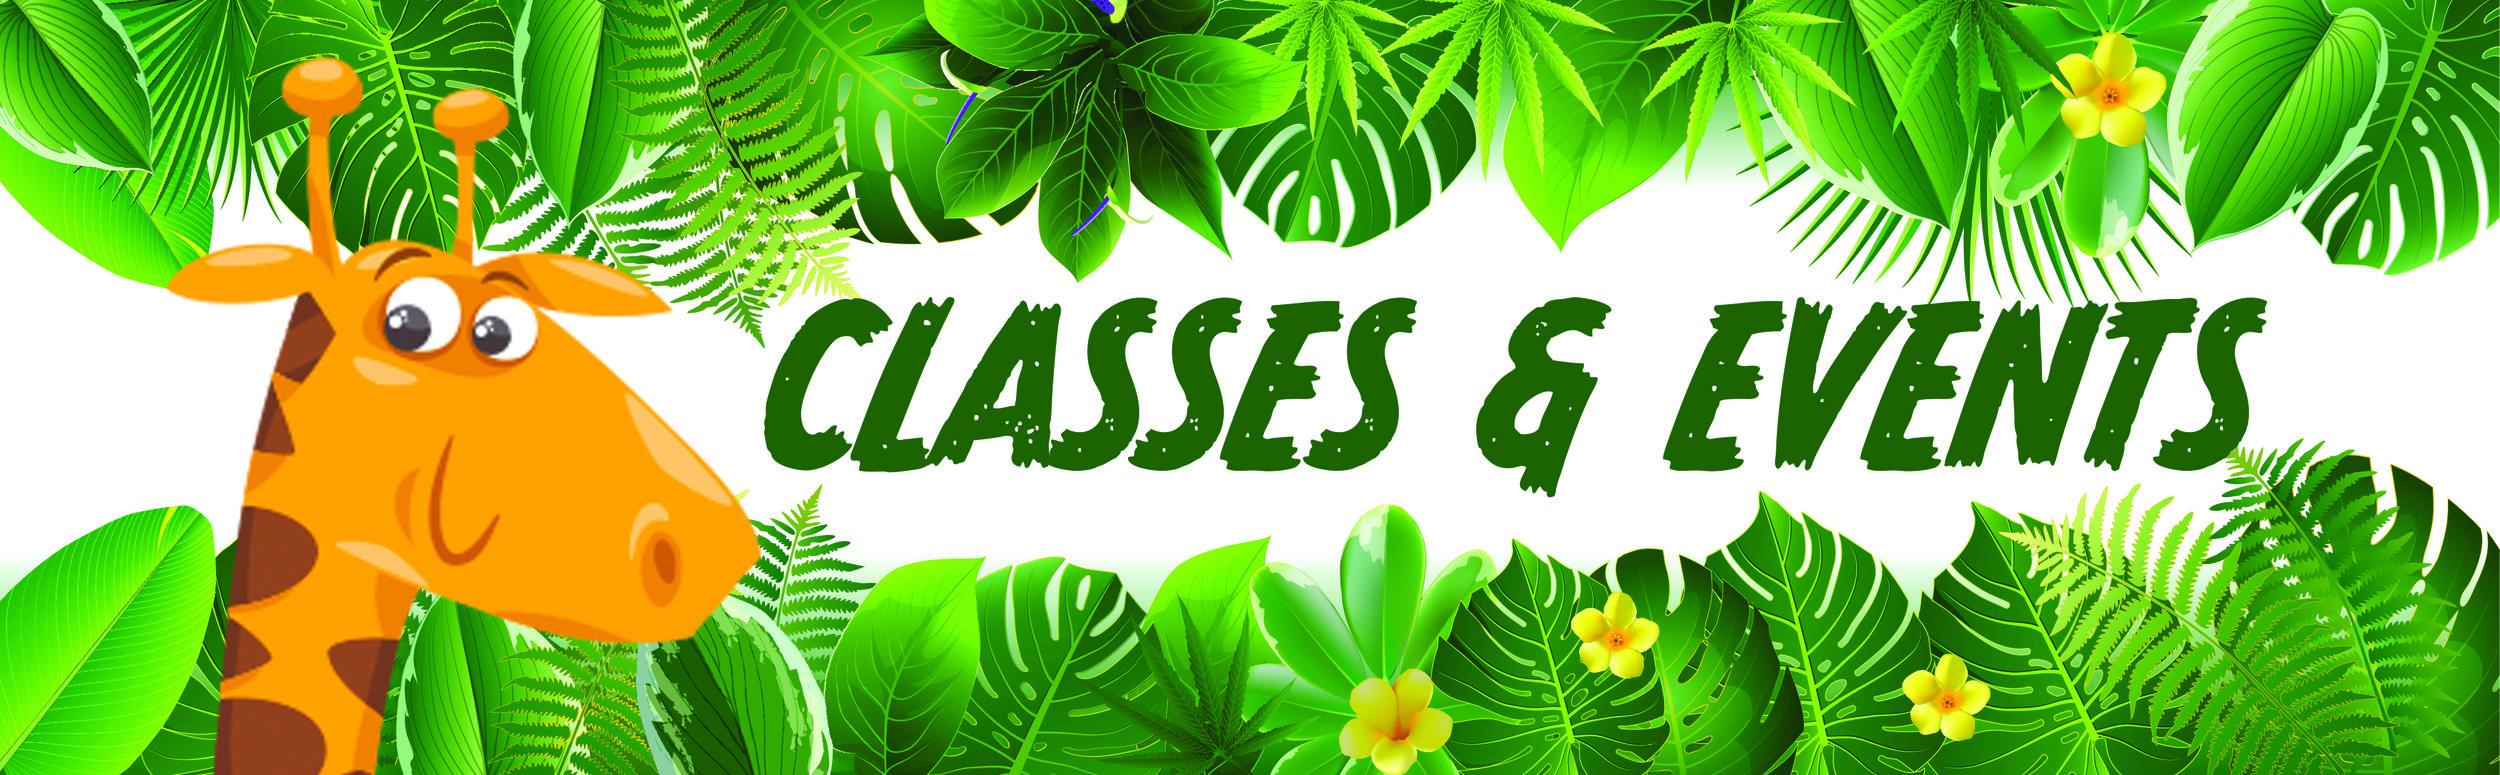 classes-1.jpg